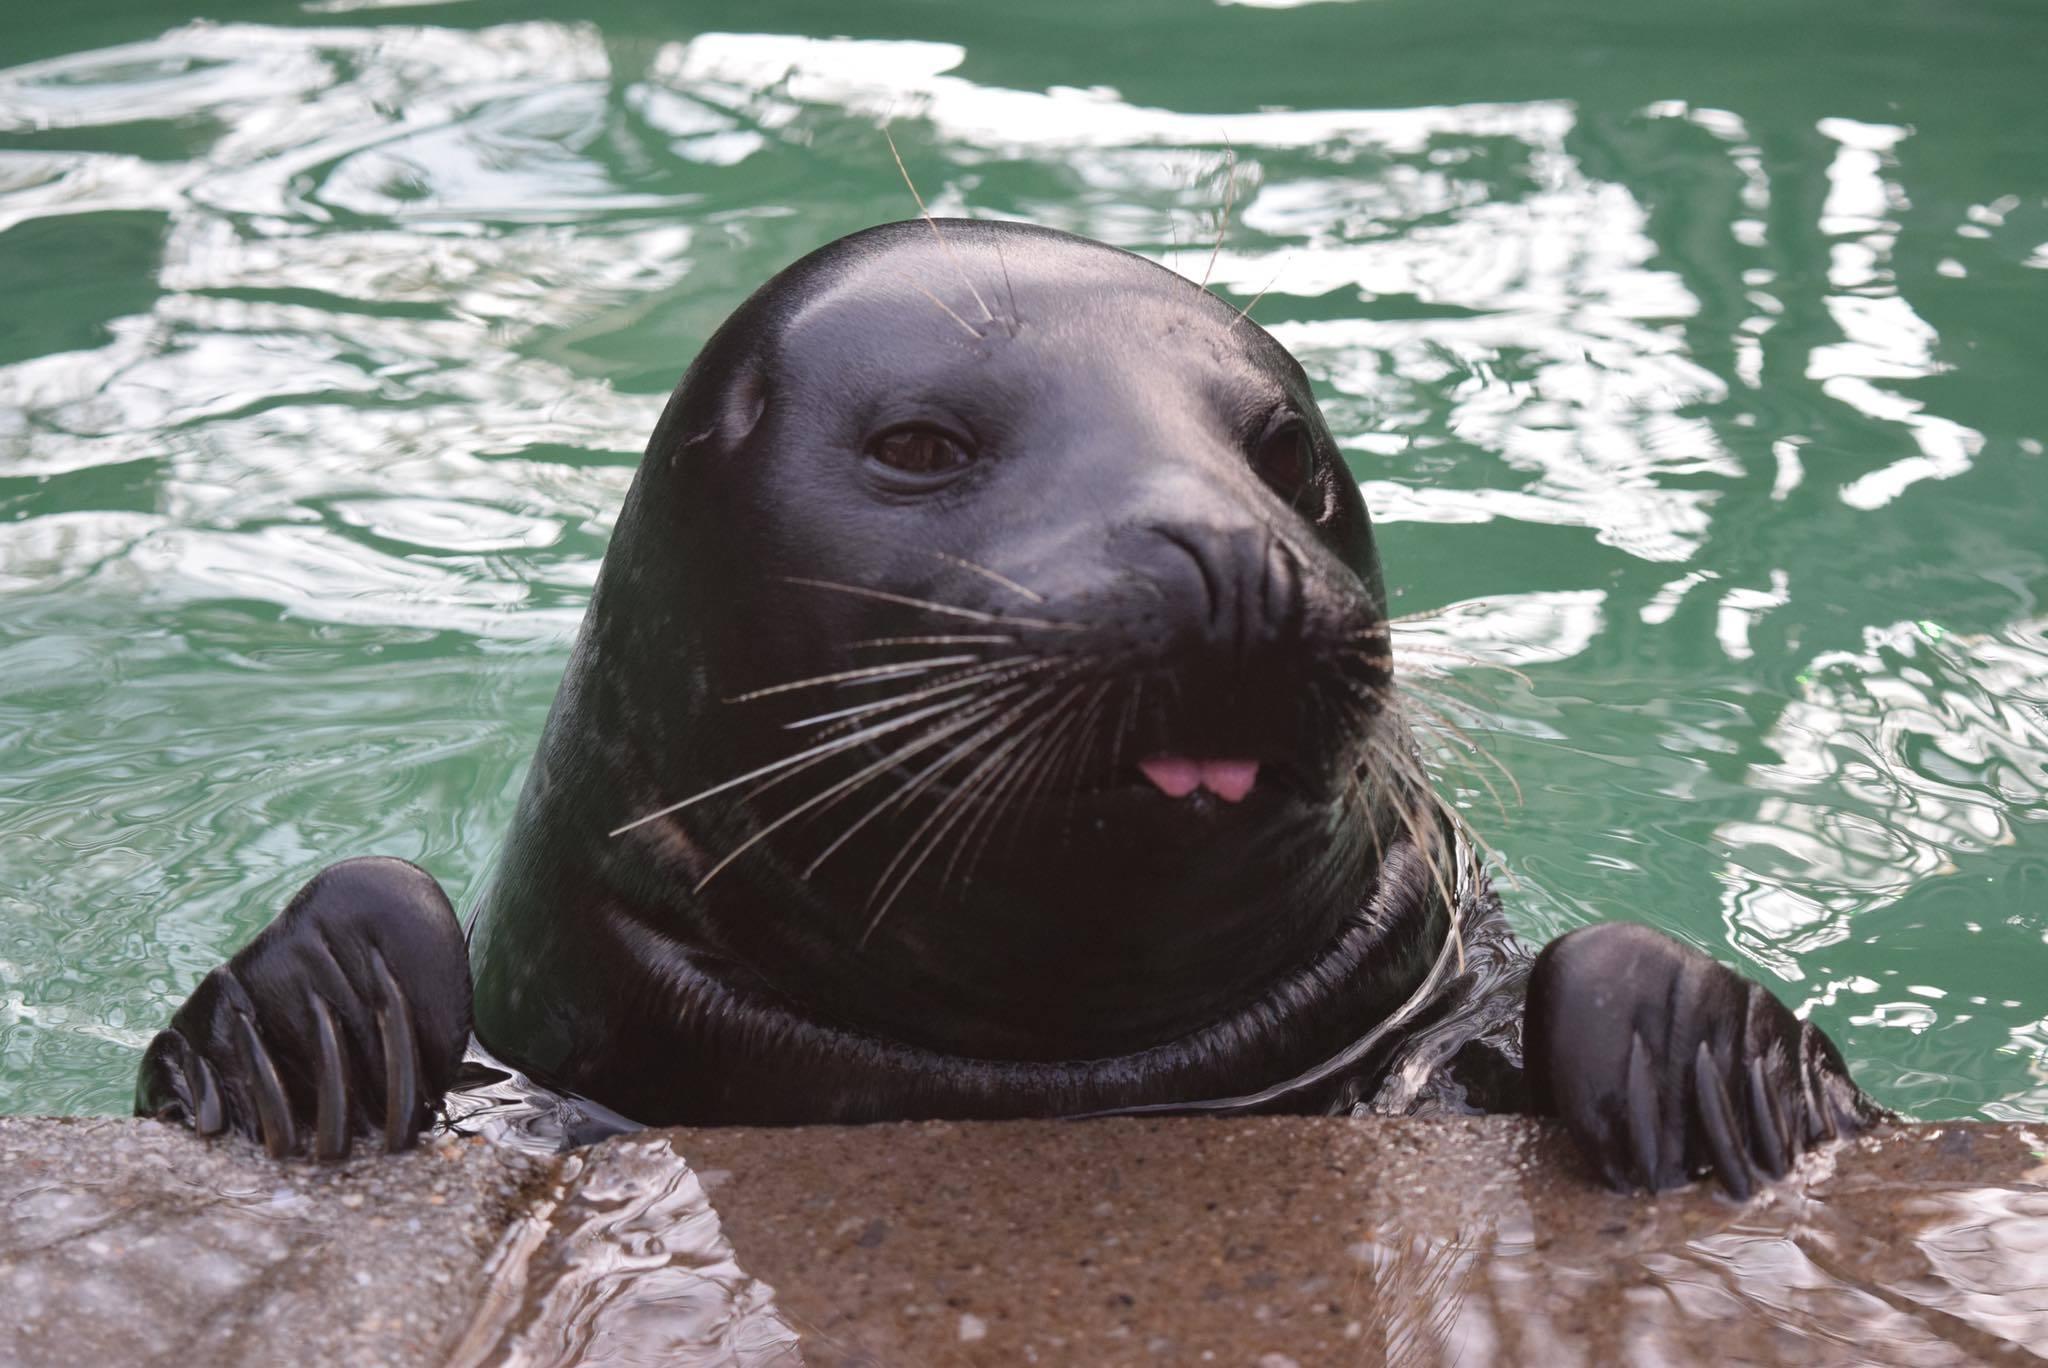 Lumiere the harbor seal at Aquarium of Niagara